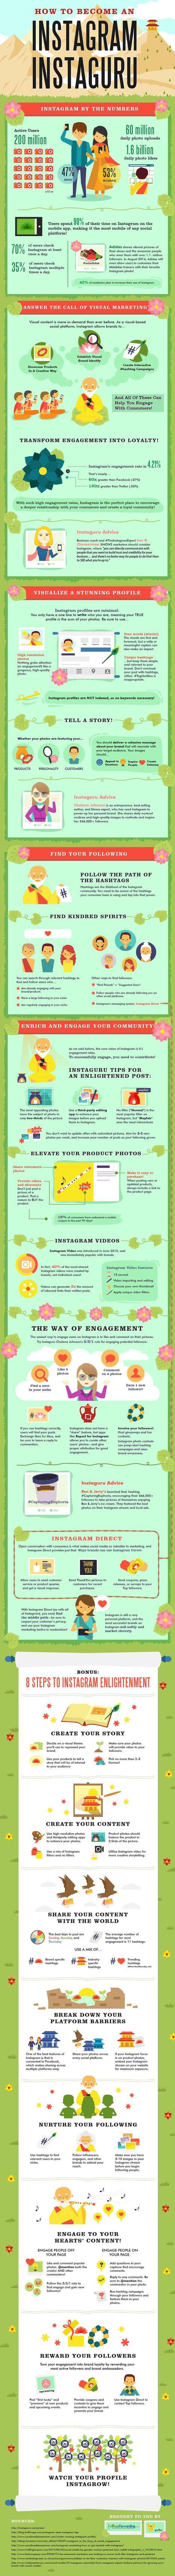 How To Become An Instagram Guru [Infographic] | Marketing with Instagram | Scoop.it